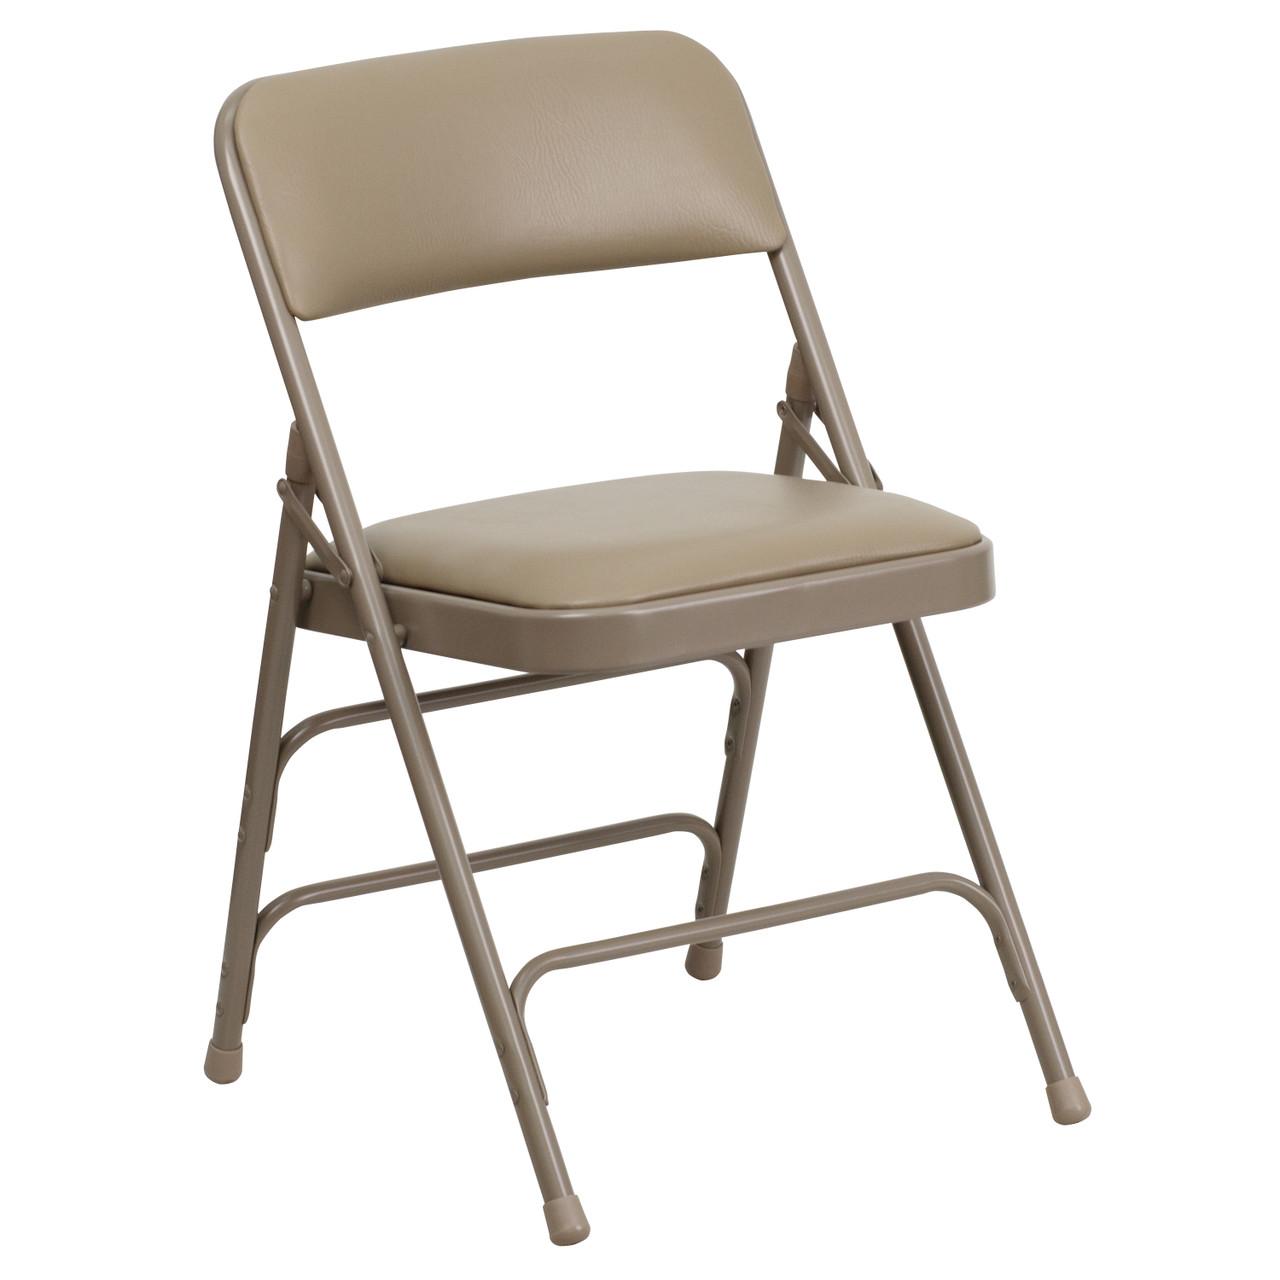 Pleasing Advantage Beige Padded Folding Chair Beige 1 In Vinyl Seat Ha Mc309Av Bge Gg Pabps2019 Chair Design Images Pabps2019Com